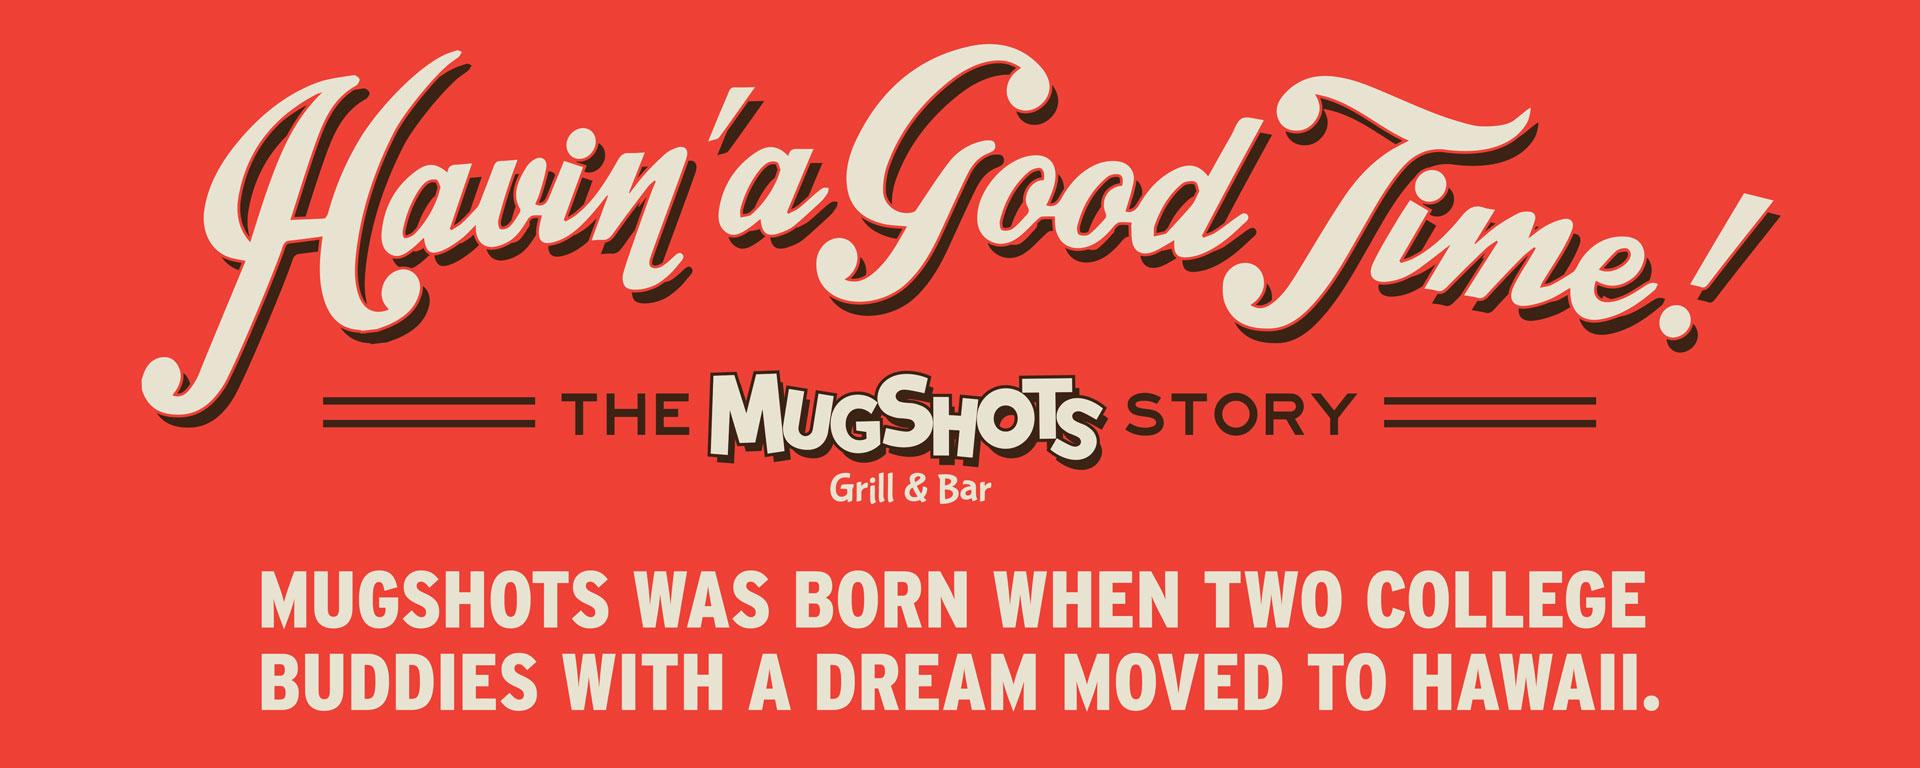 mugshots-story-header-2.jpg